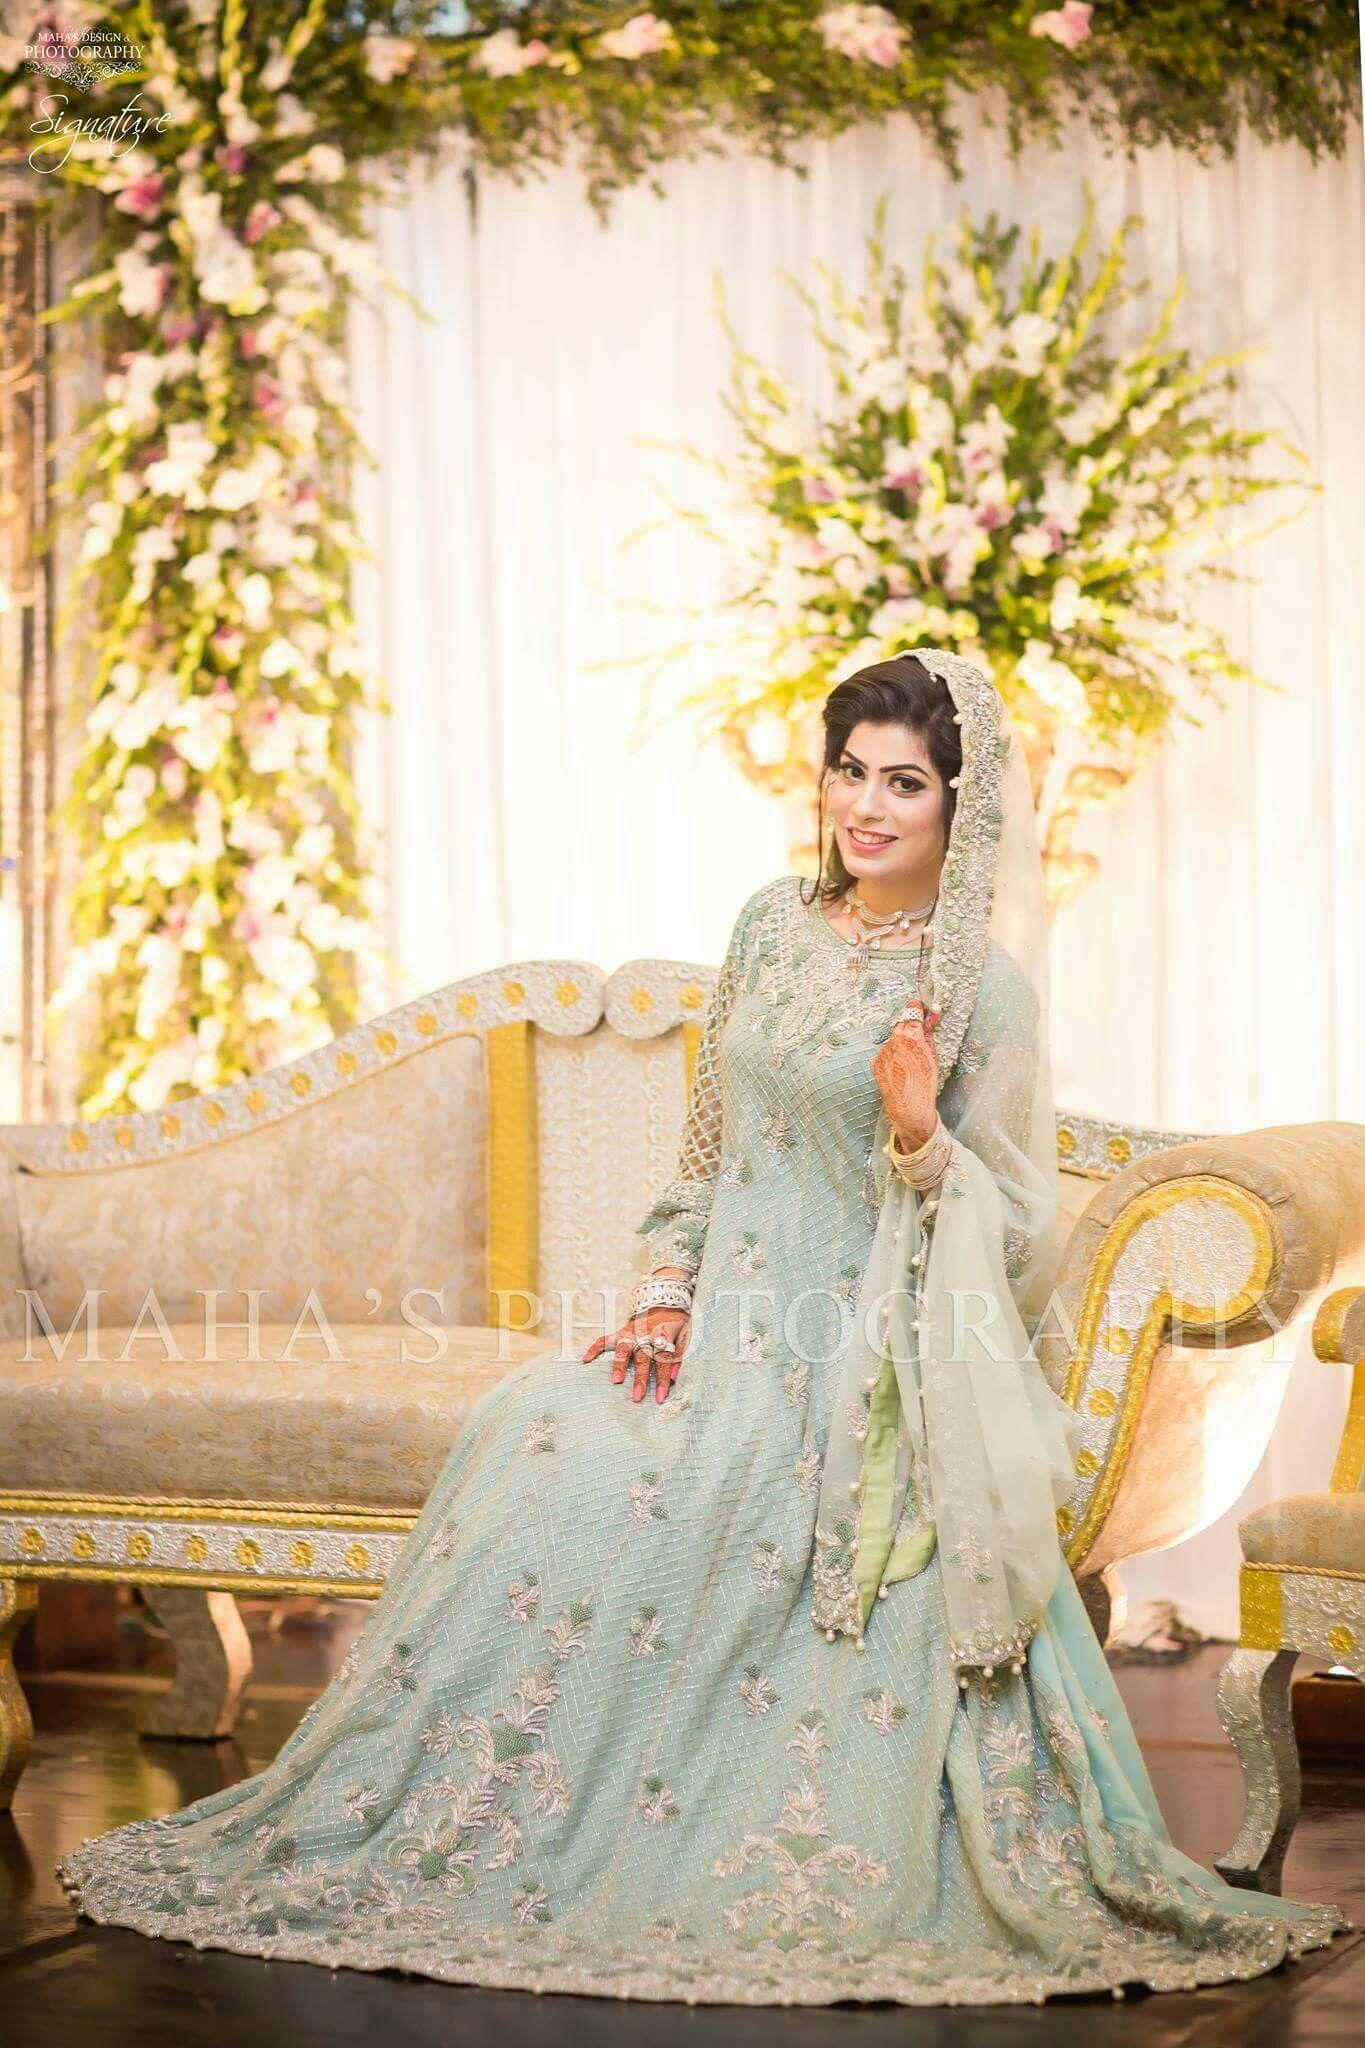 Pin By Sophia K On Pakistani Wedding Pakistani Wedding Dresses